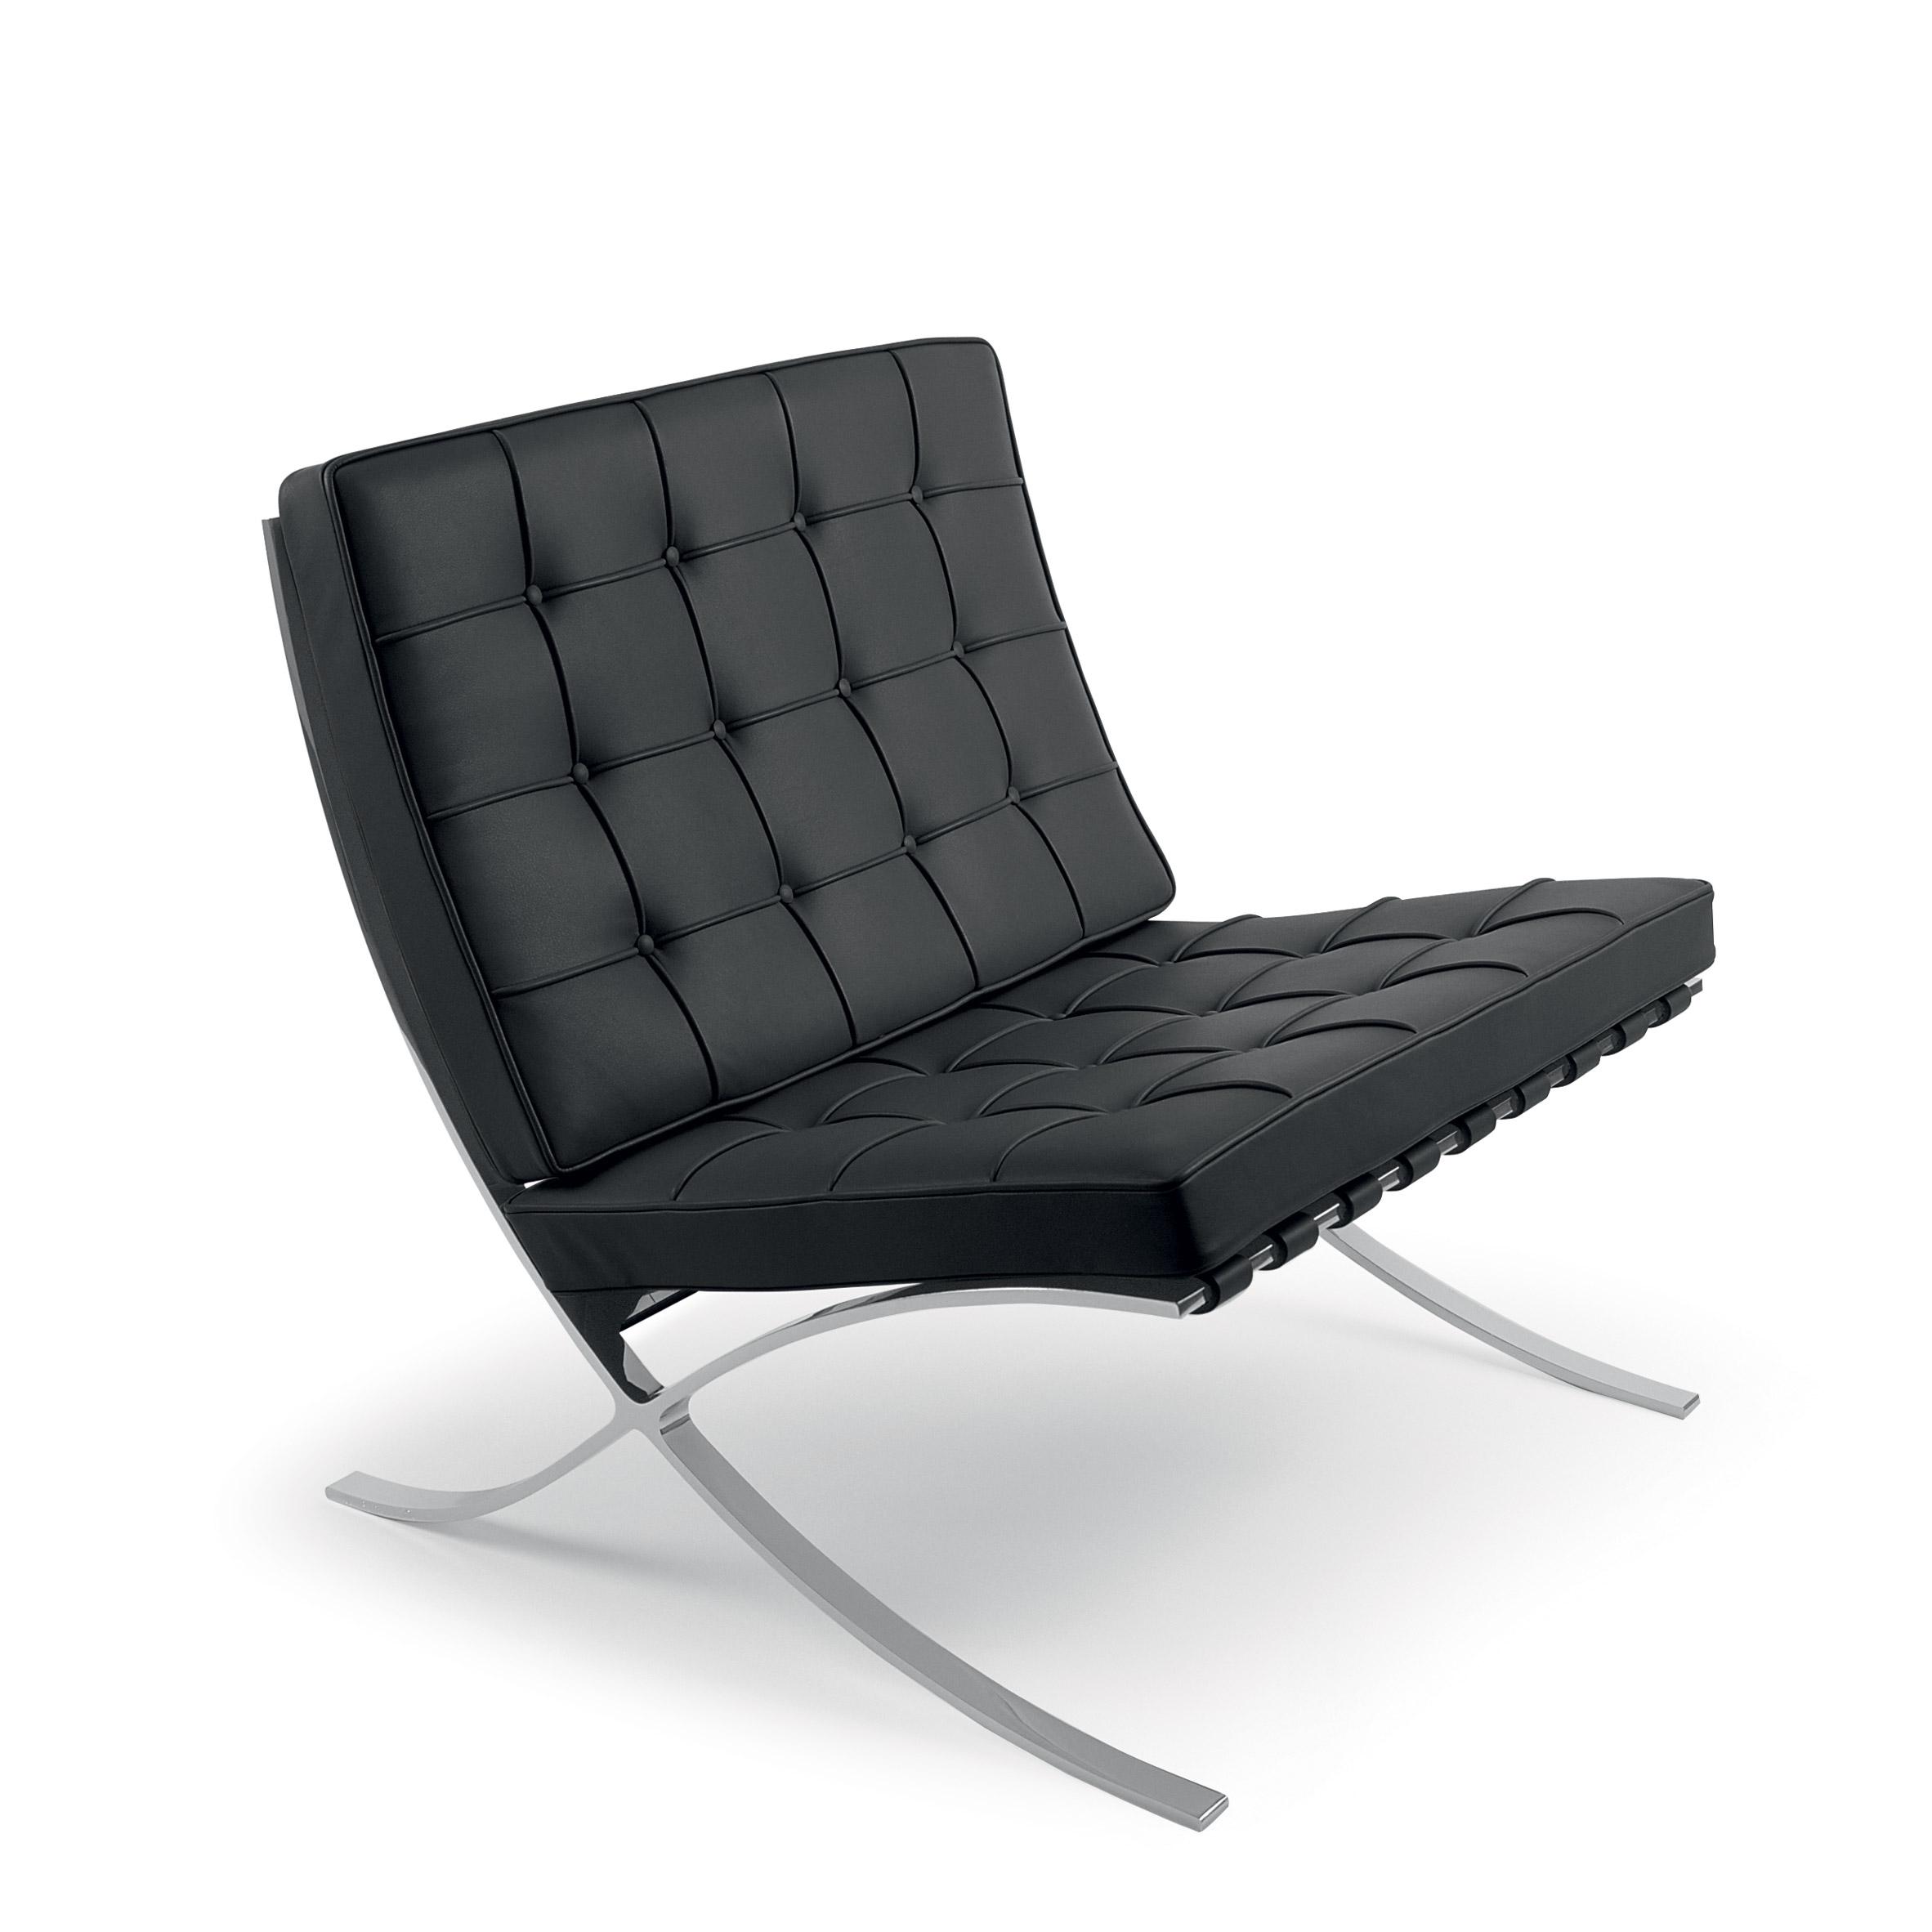 Ghế Barcelona thiết kế bởi Mies van der Rohe & Lilly Reich